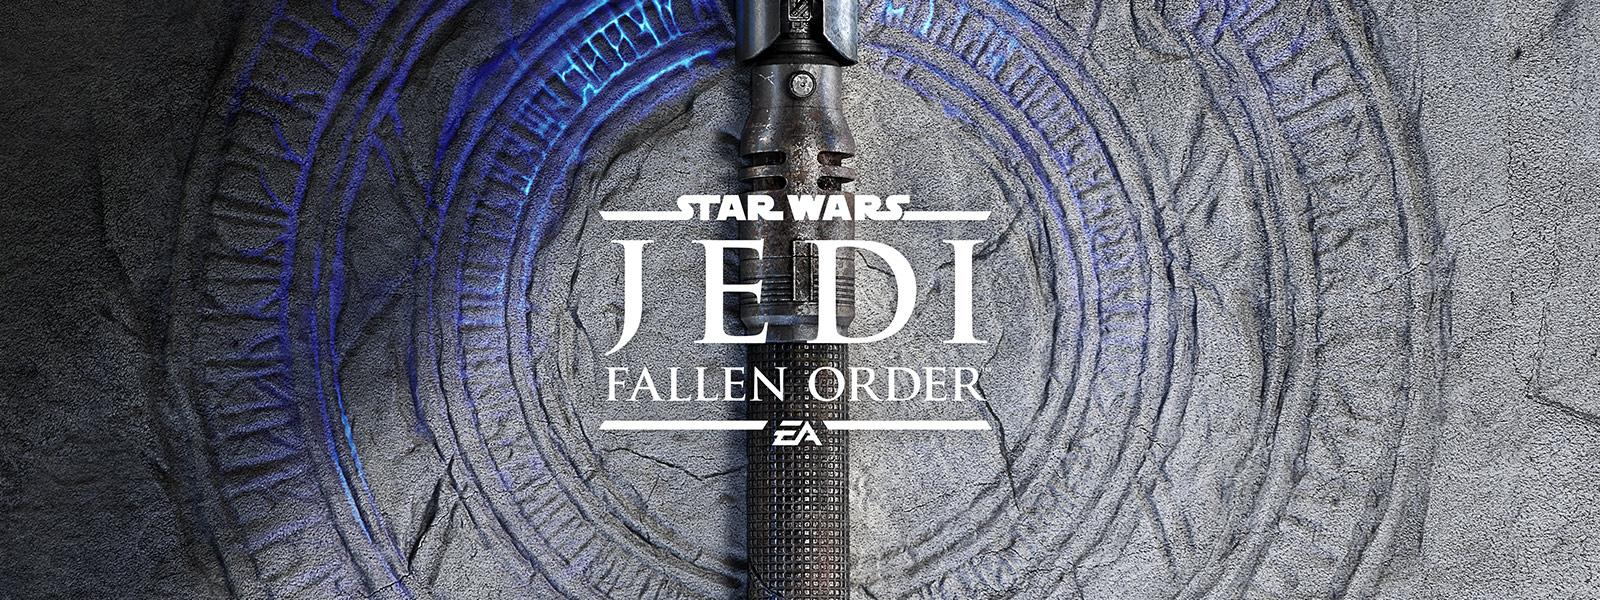 Star Wars Jedi Fallen Order 標誌,地上的裂縫發出藍光,上面有把光劍